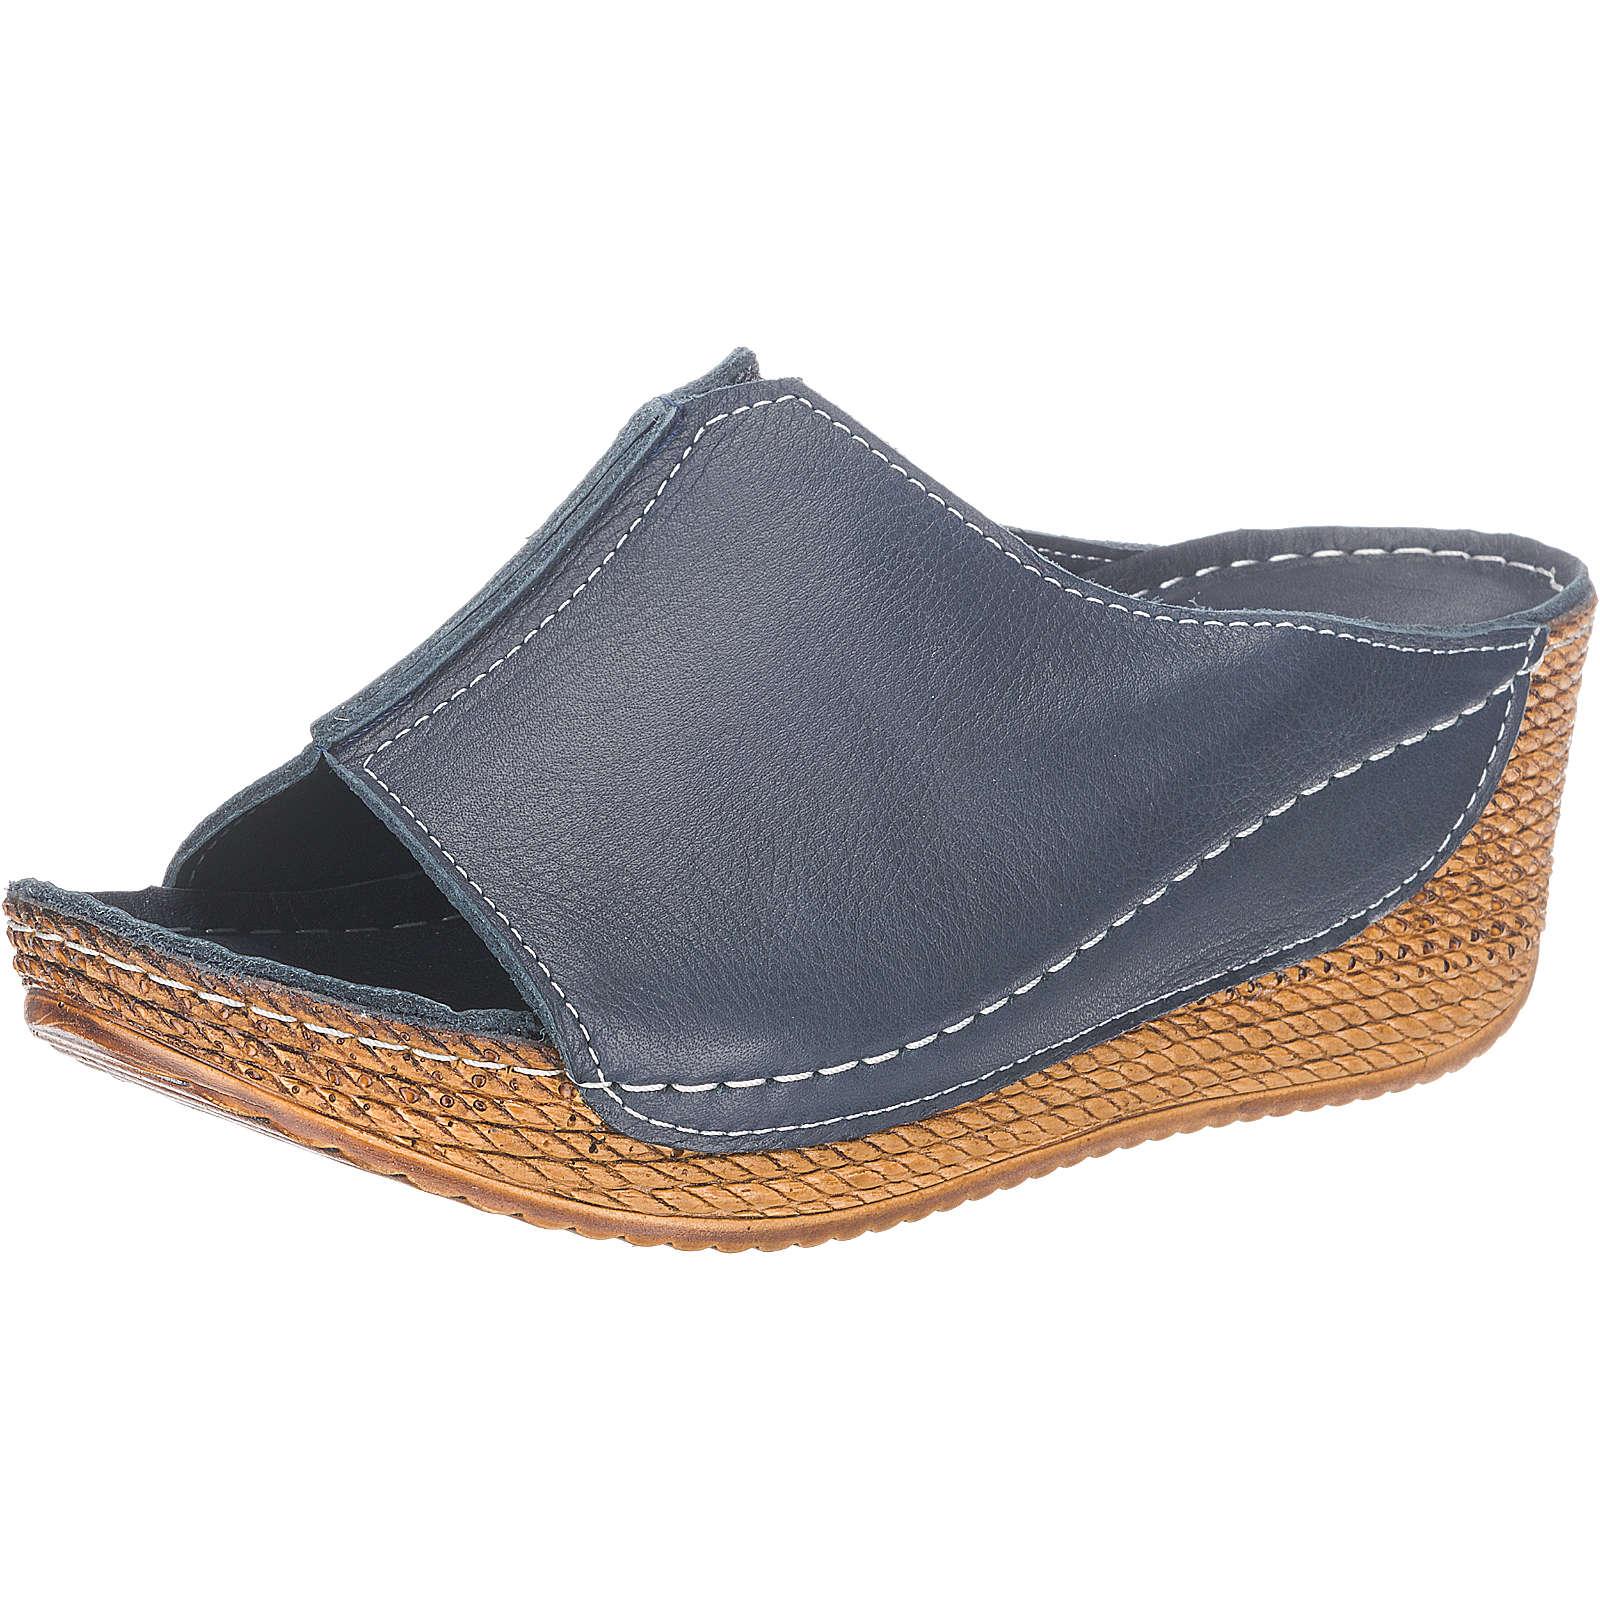 Andrea Conti Pantoletten dunkelblau Damen Gr. 41 jetztbilligerkaufen